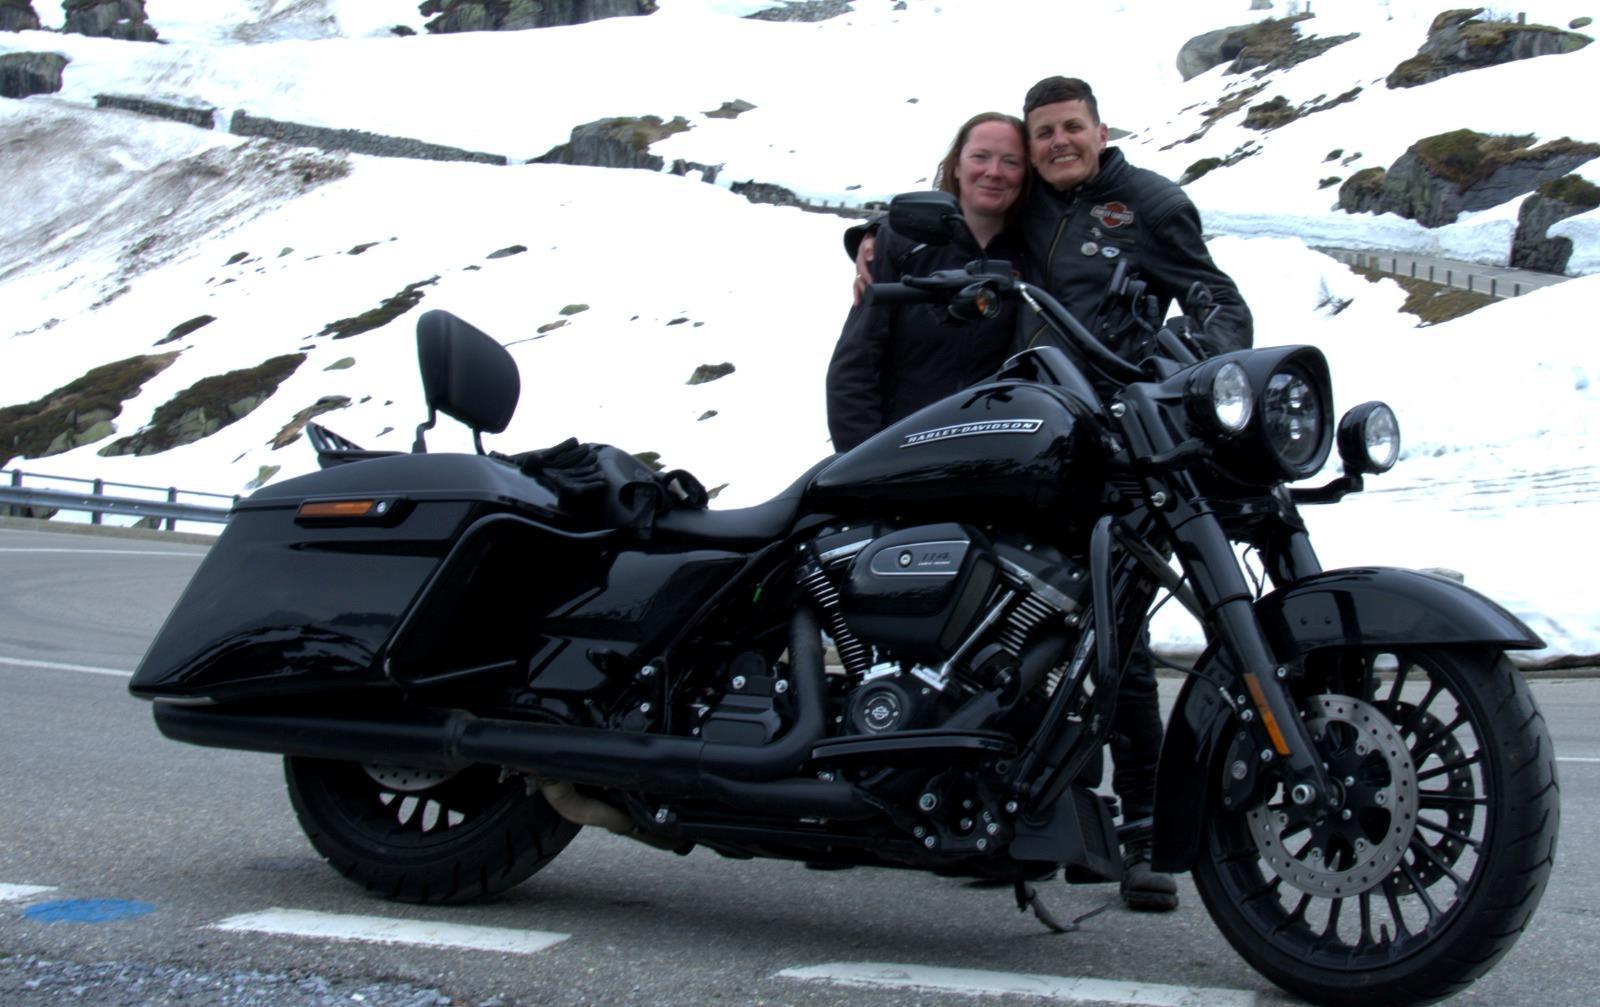 R5K members reach the alpine snow line on Harleys